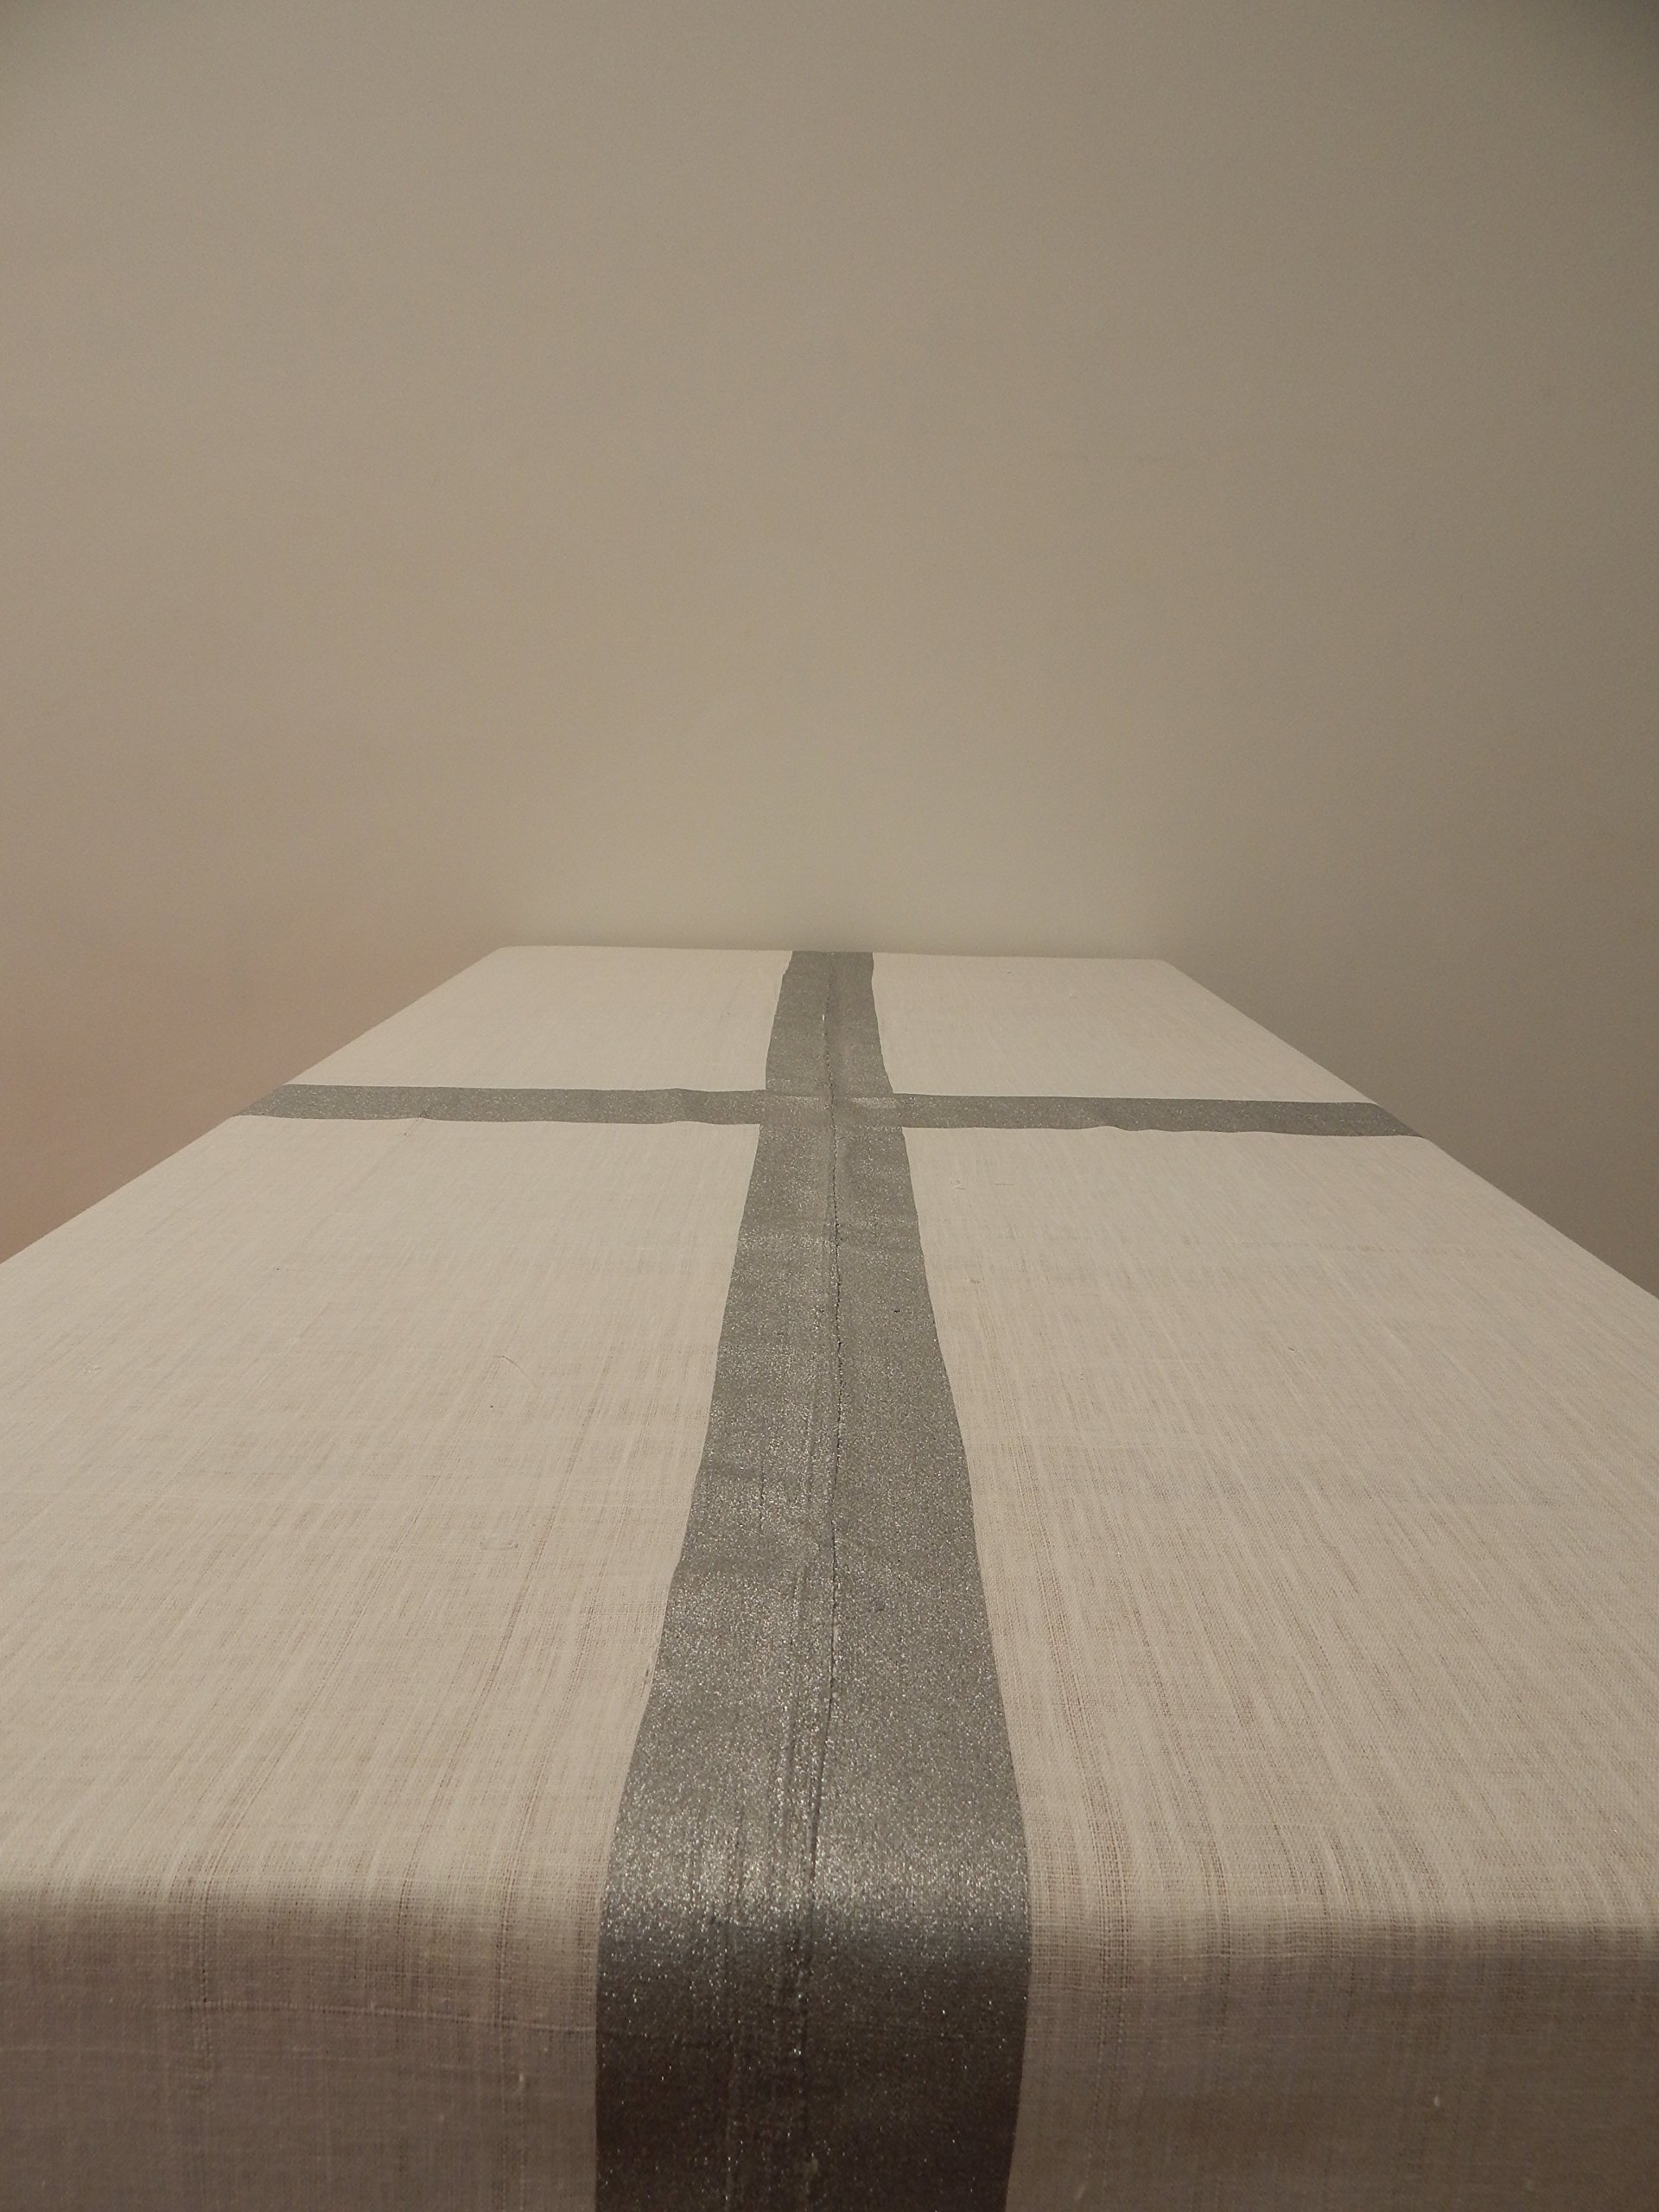 Gitika Goyal Home Cotton Khadi Silver Screen Printed Tablecloth with Border Design, White, 60'' x 90''